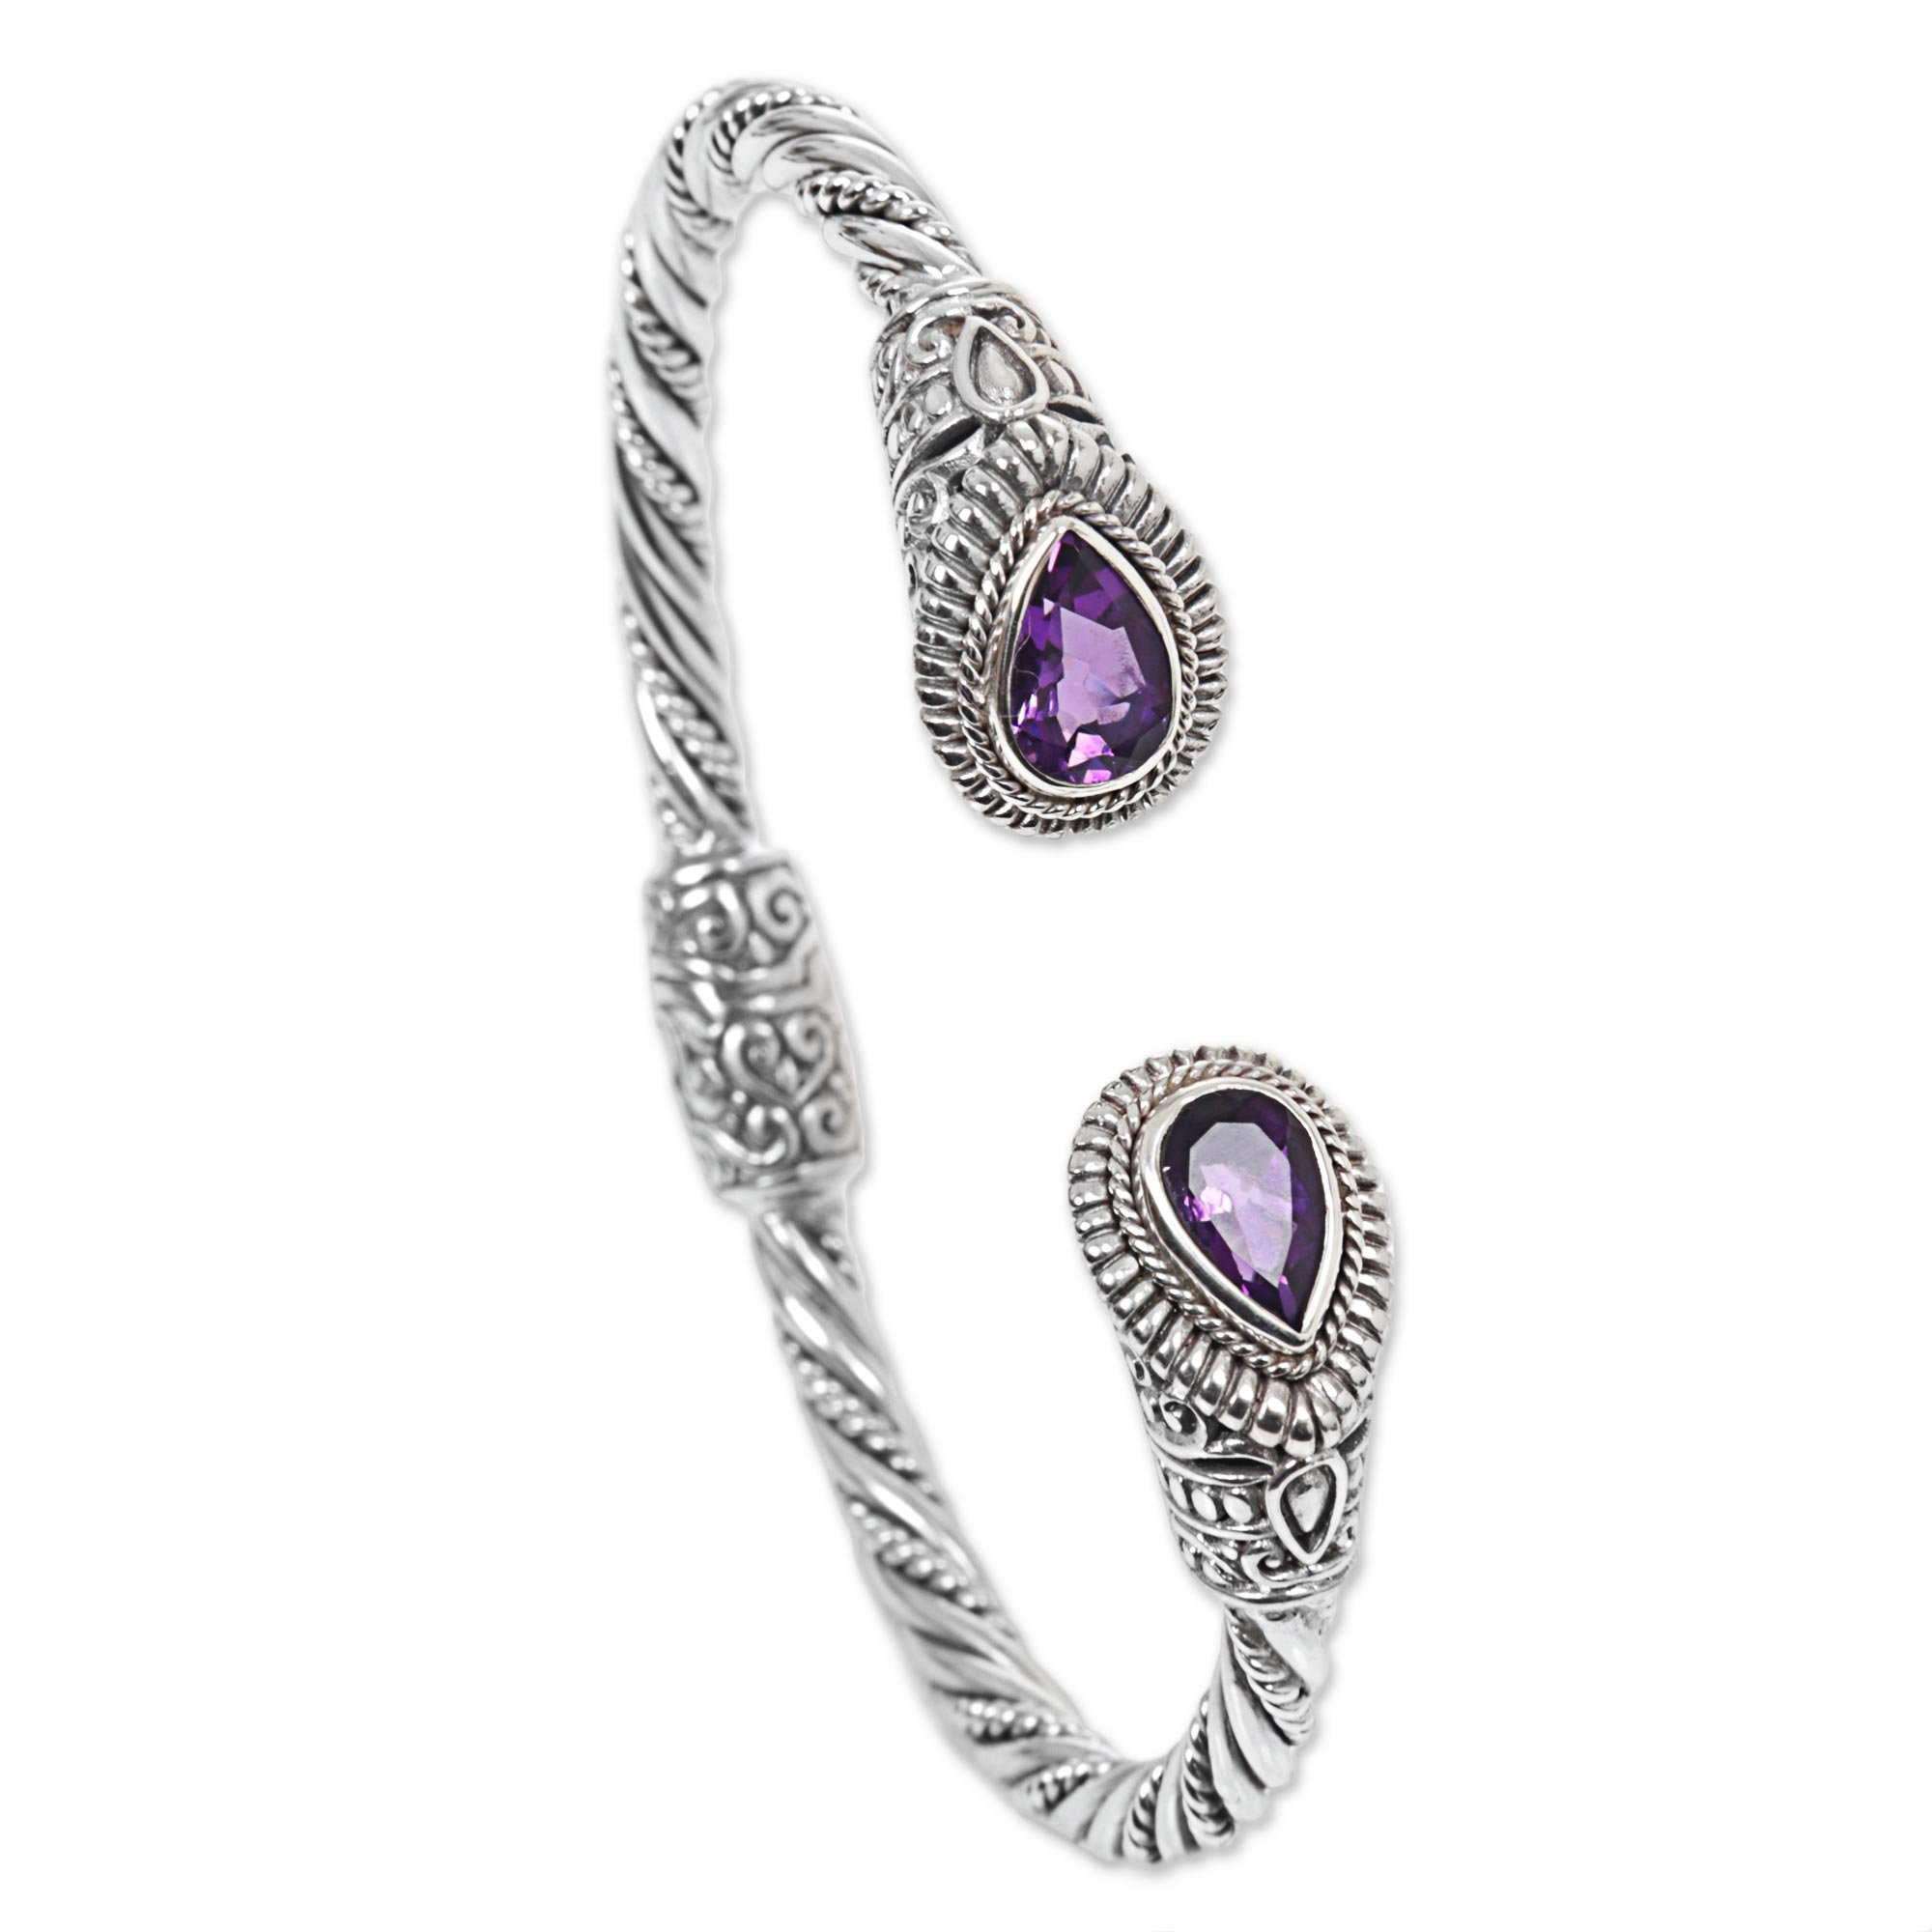 NOVICA Amethyst .925 Sterling Silver Hinged Twist Cuff Bracelet 'Bright Eyes' by NOVICA